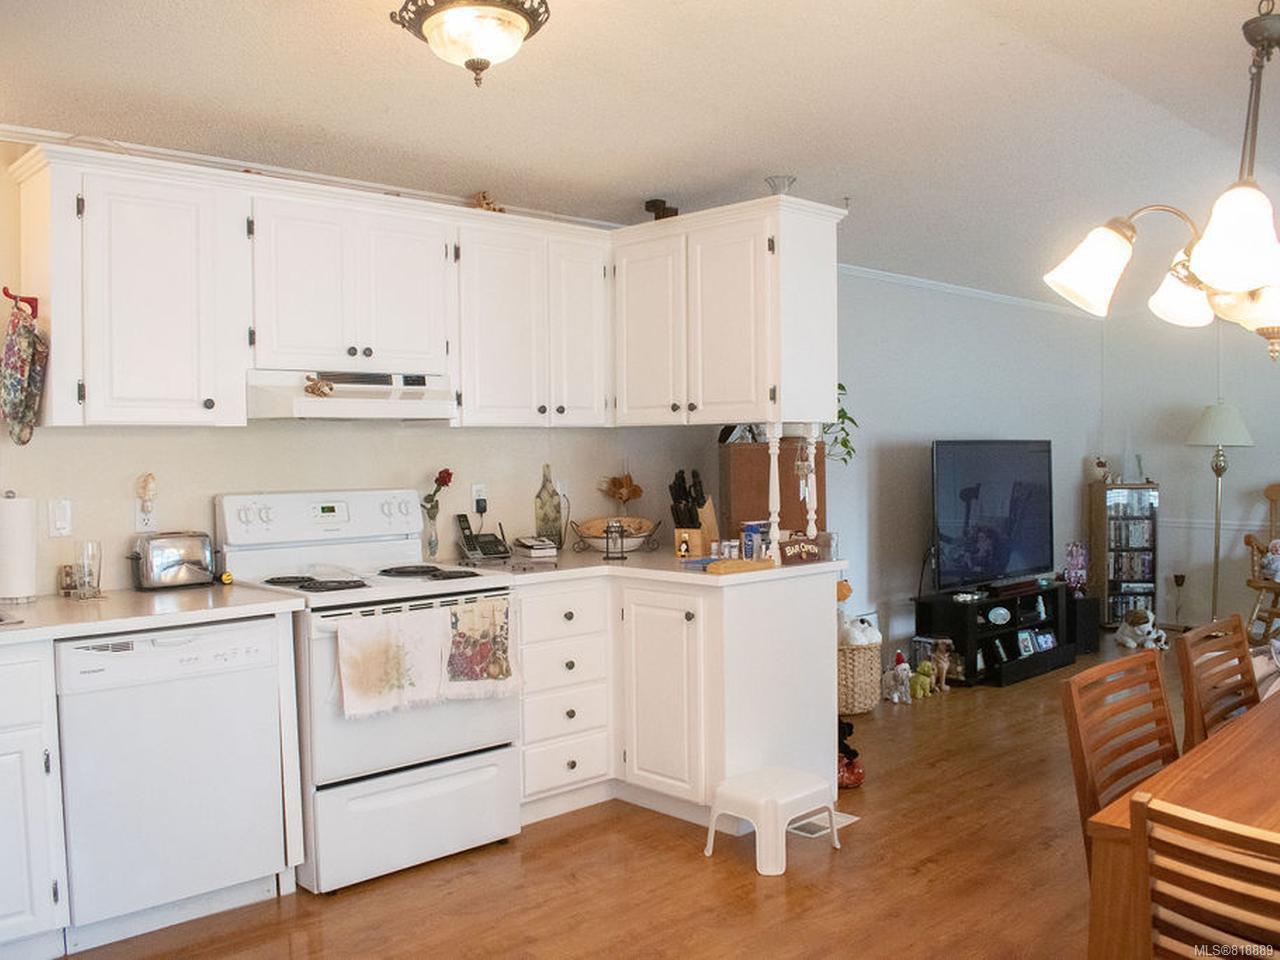 Photo 4: Photos: 27 6225 Lugrin Rd in PORT ALBERNI: PA Alberni Valley Manufactured Home for sale (Port Alberni)  : MLS®# 818889